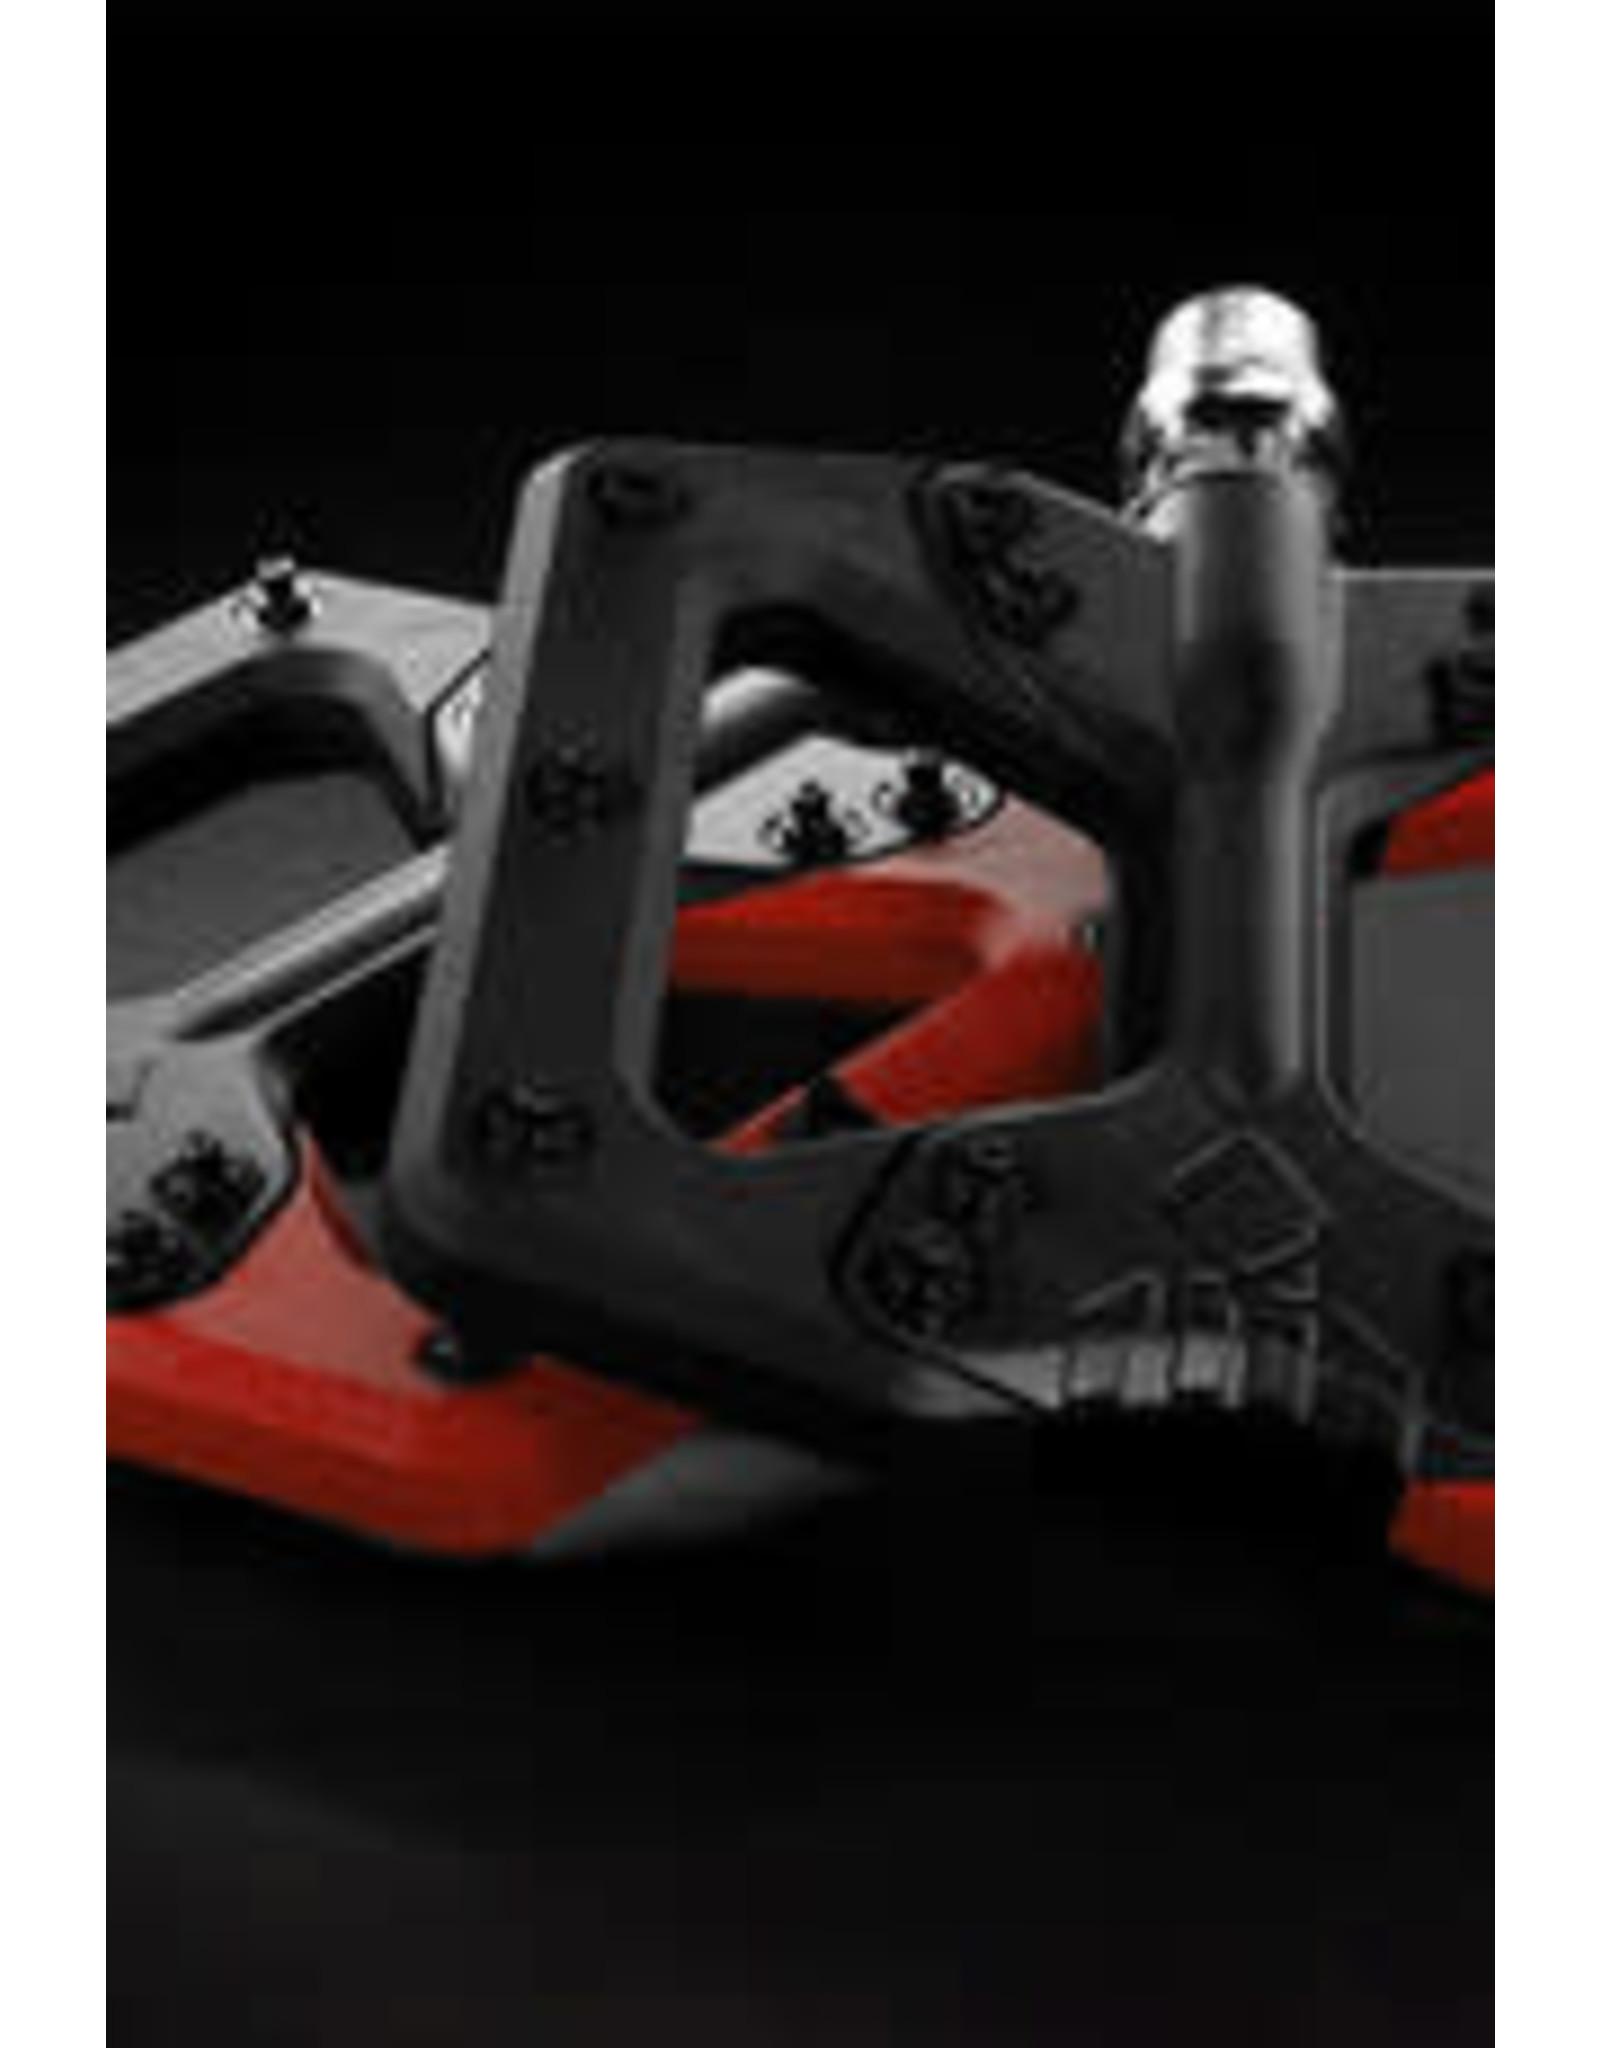 Squidworx pedals  Seasons Edition